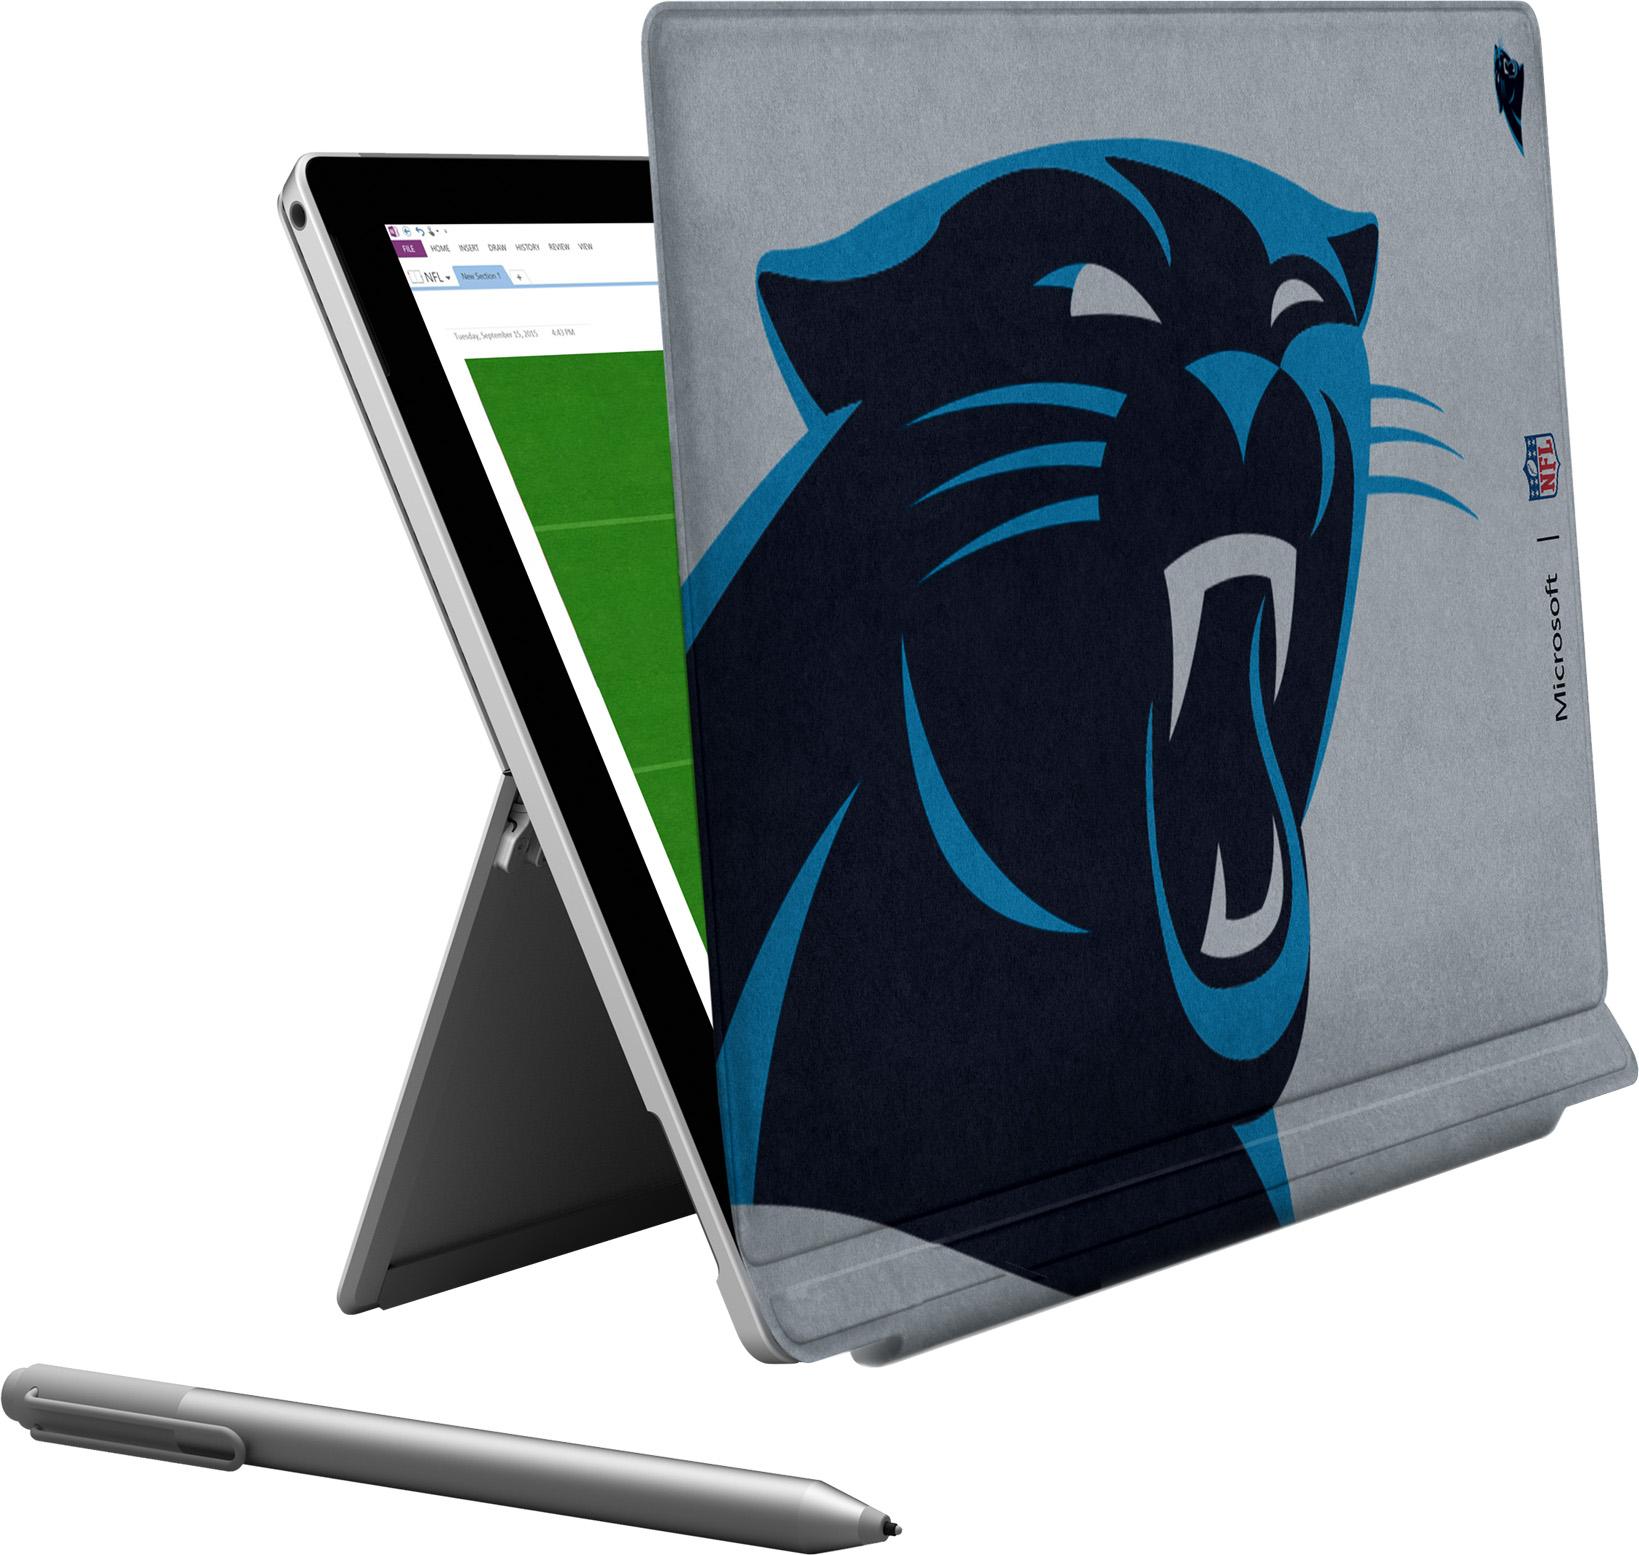 Microsoft Surface Pro 4 Carolina Panthers Type Cover